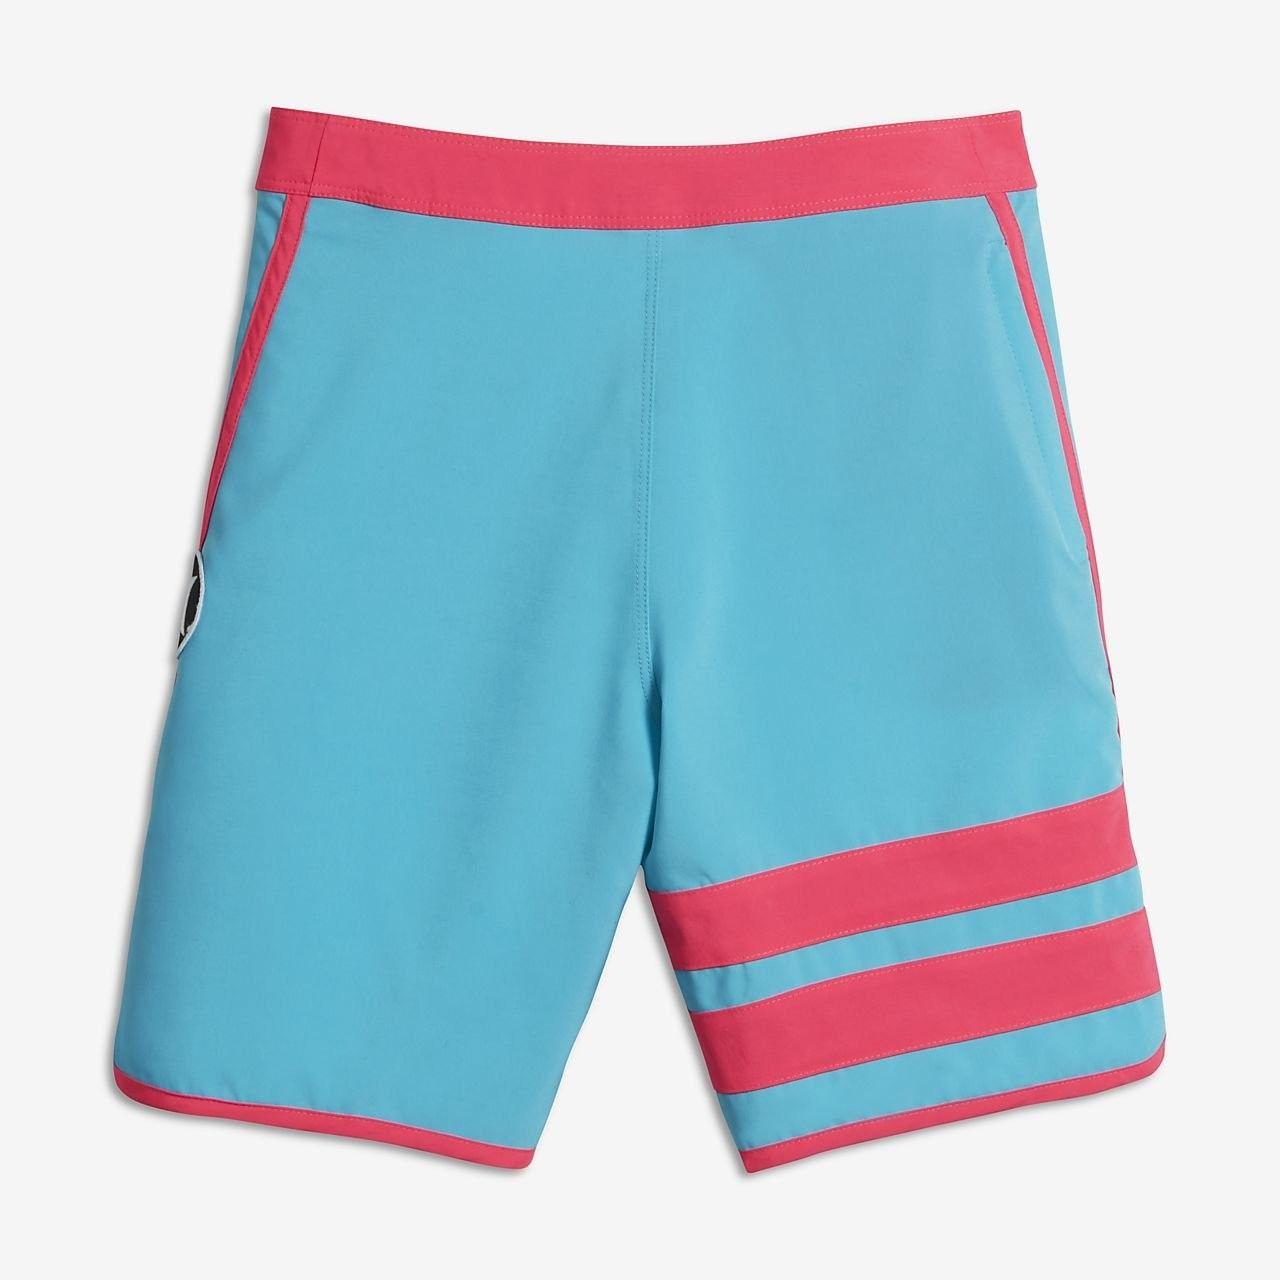 Geometric Art Modern Brown Blue Fashion Swim Trunks BingGuiC Boys Quick Dry Shorts